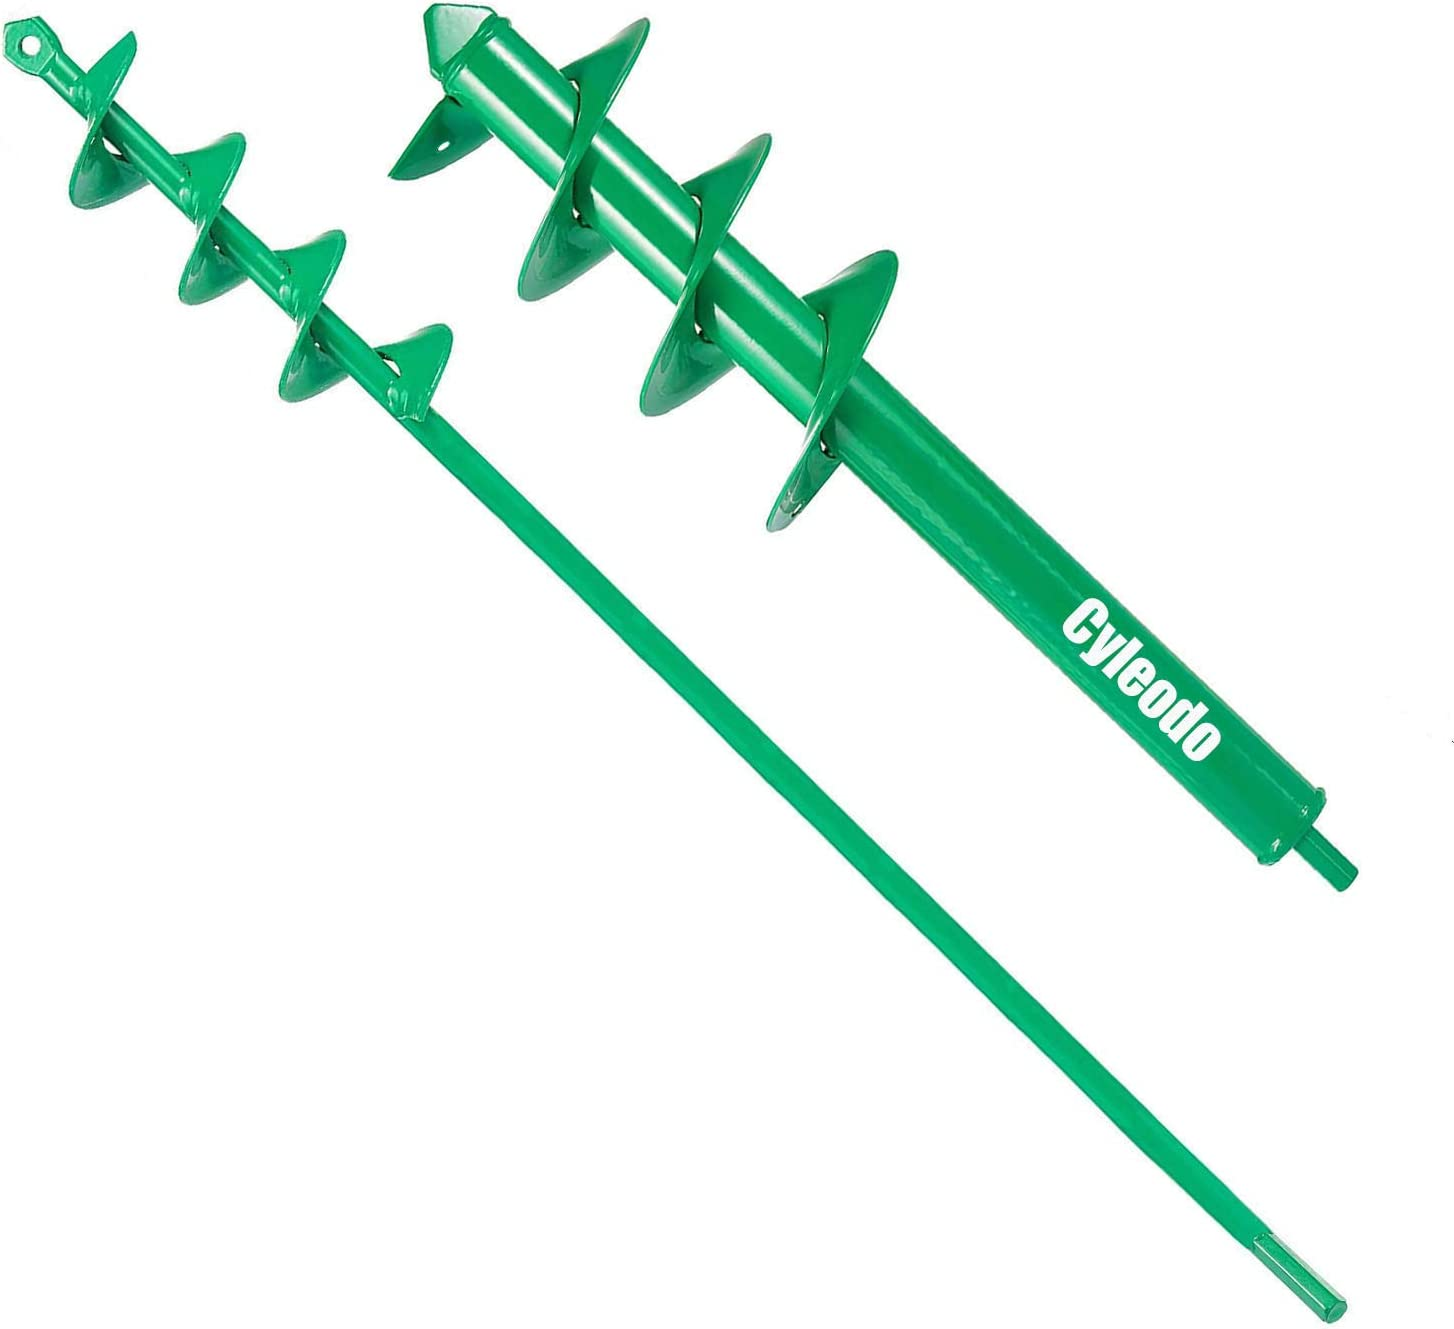 Cyleodo 2 Pack Extended Length Auger Drill Bit 30